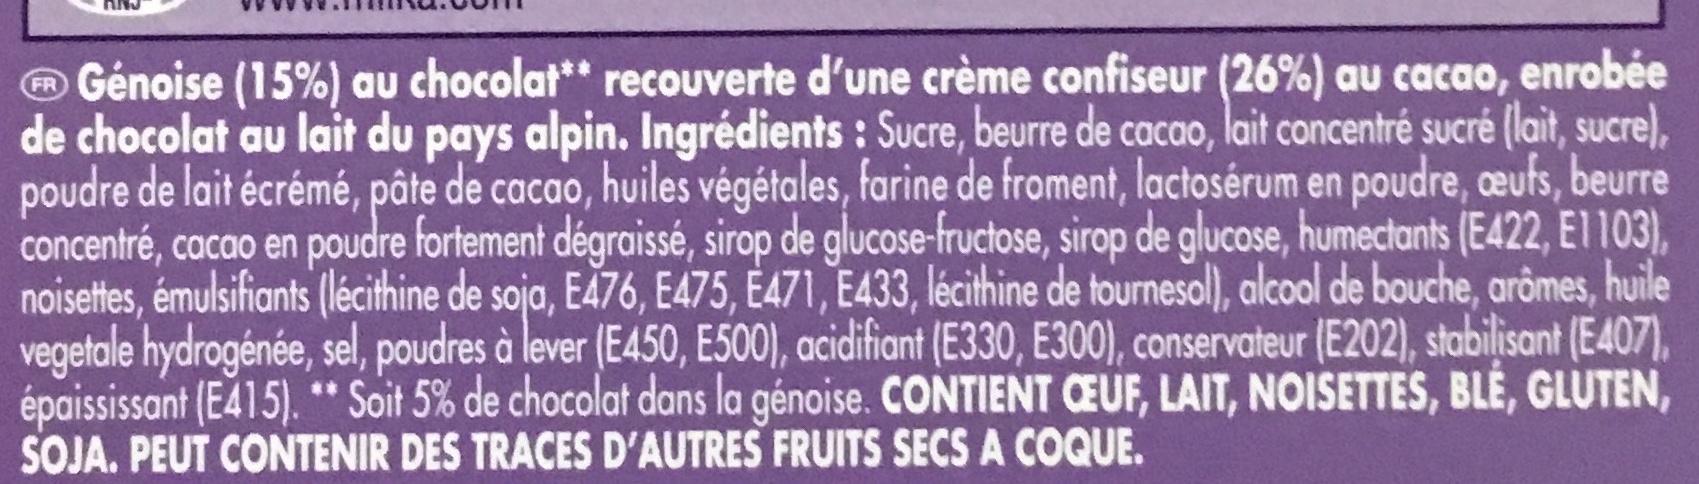 Tendres Moments Moelleux Chocolat - Ingrédients